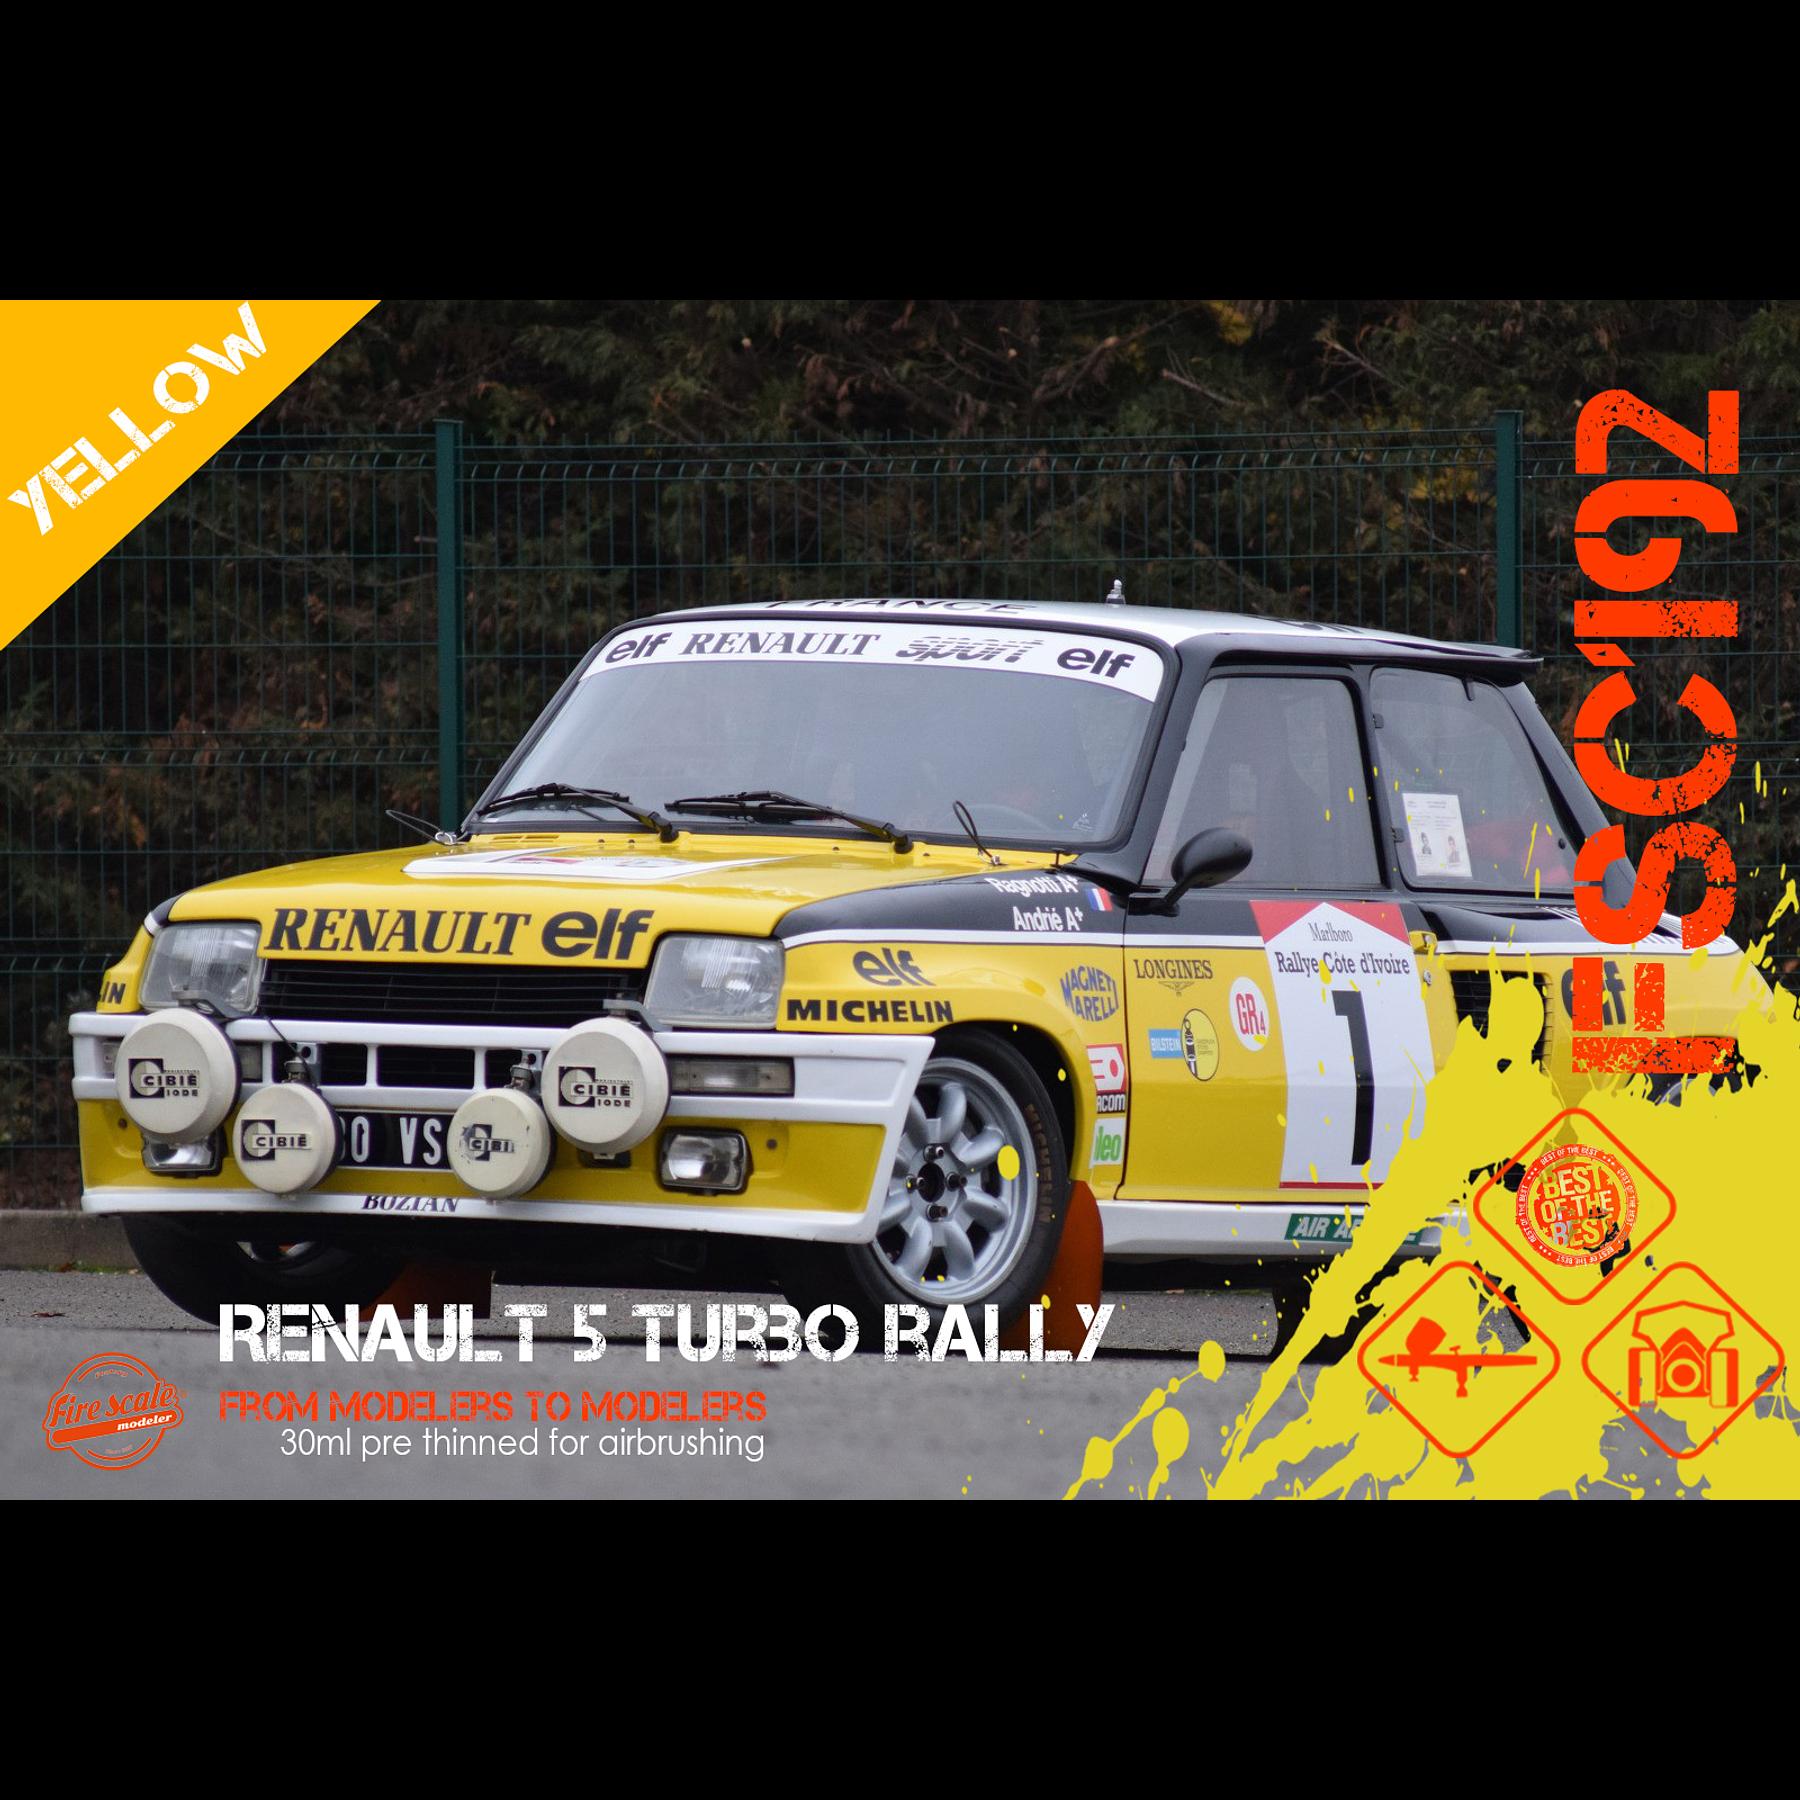 Renault 5 Turbo Rally - Amarillo